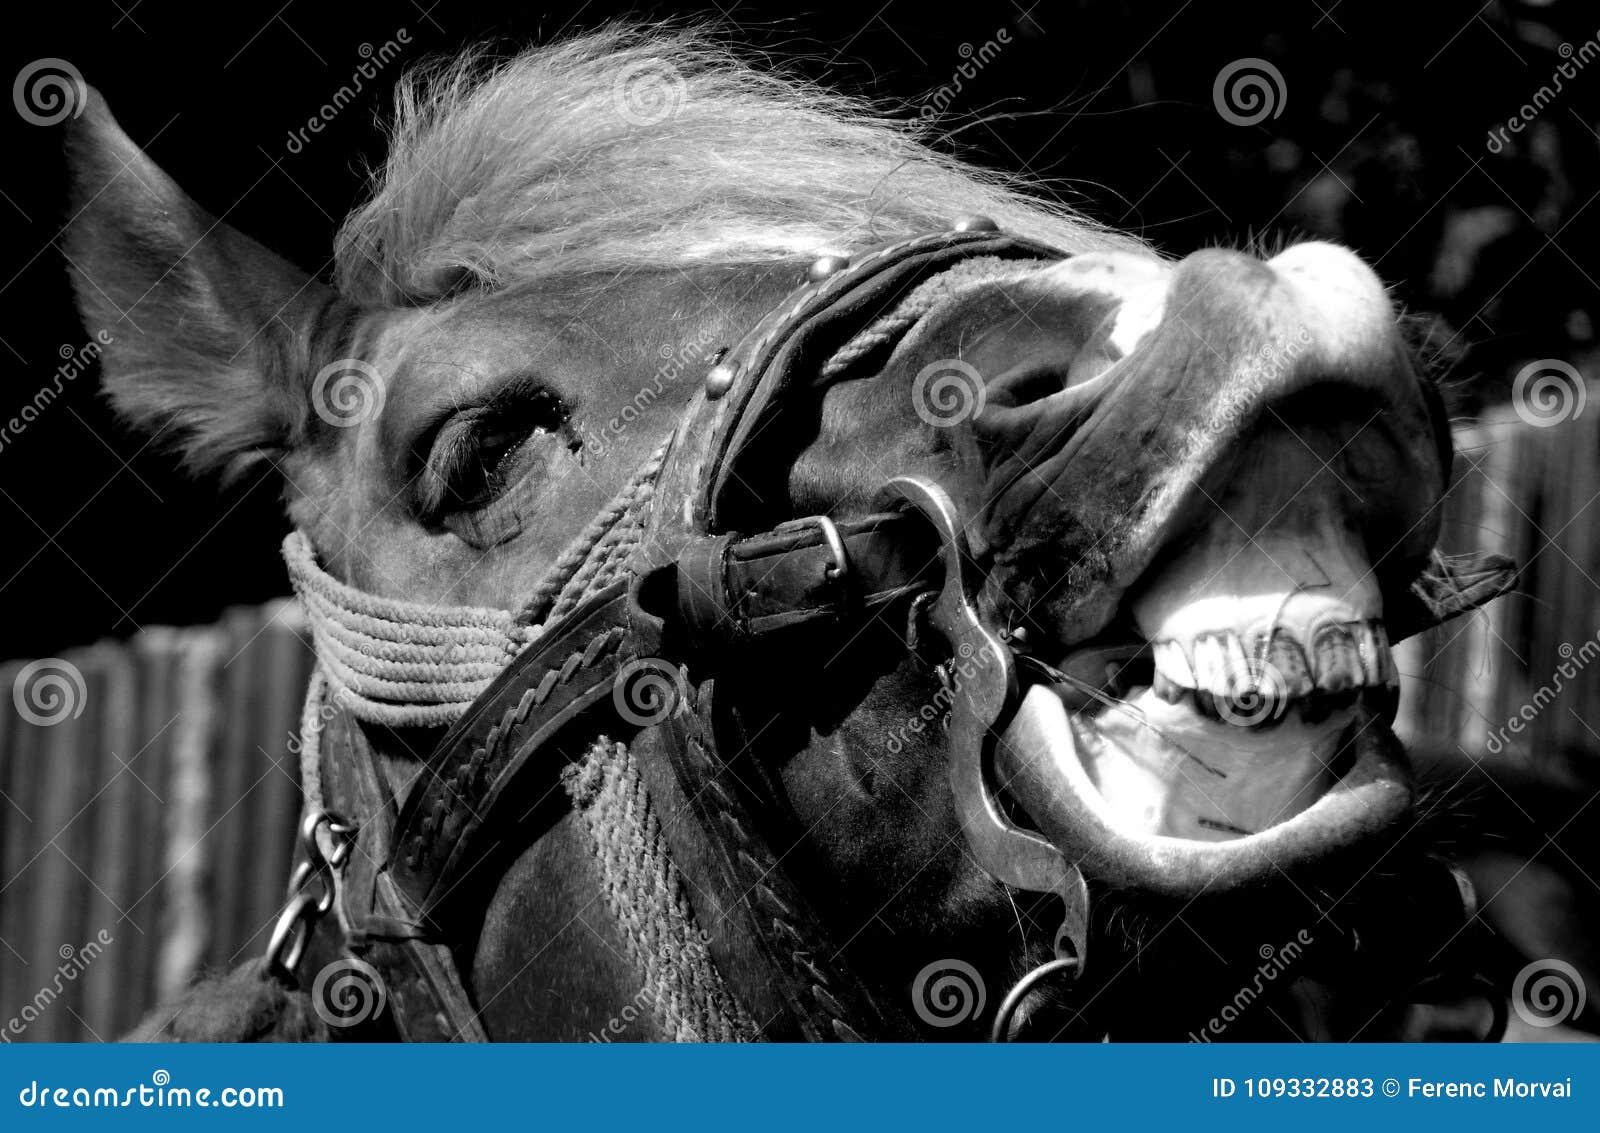 Horse portrait black and white